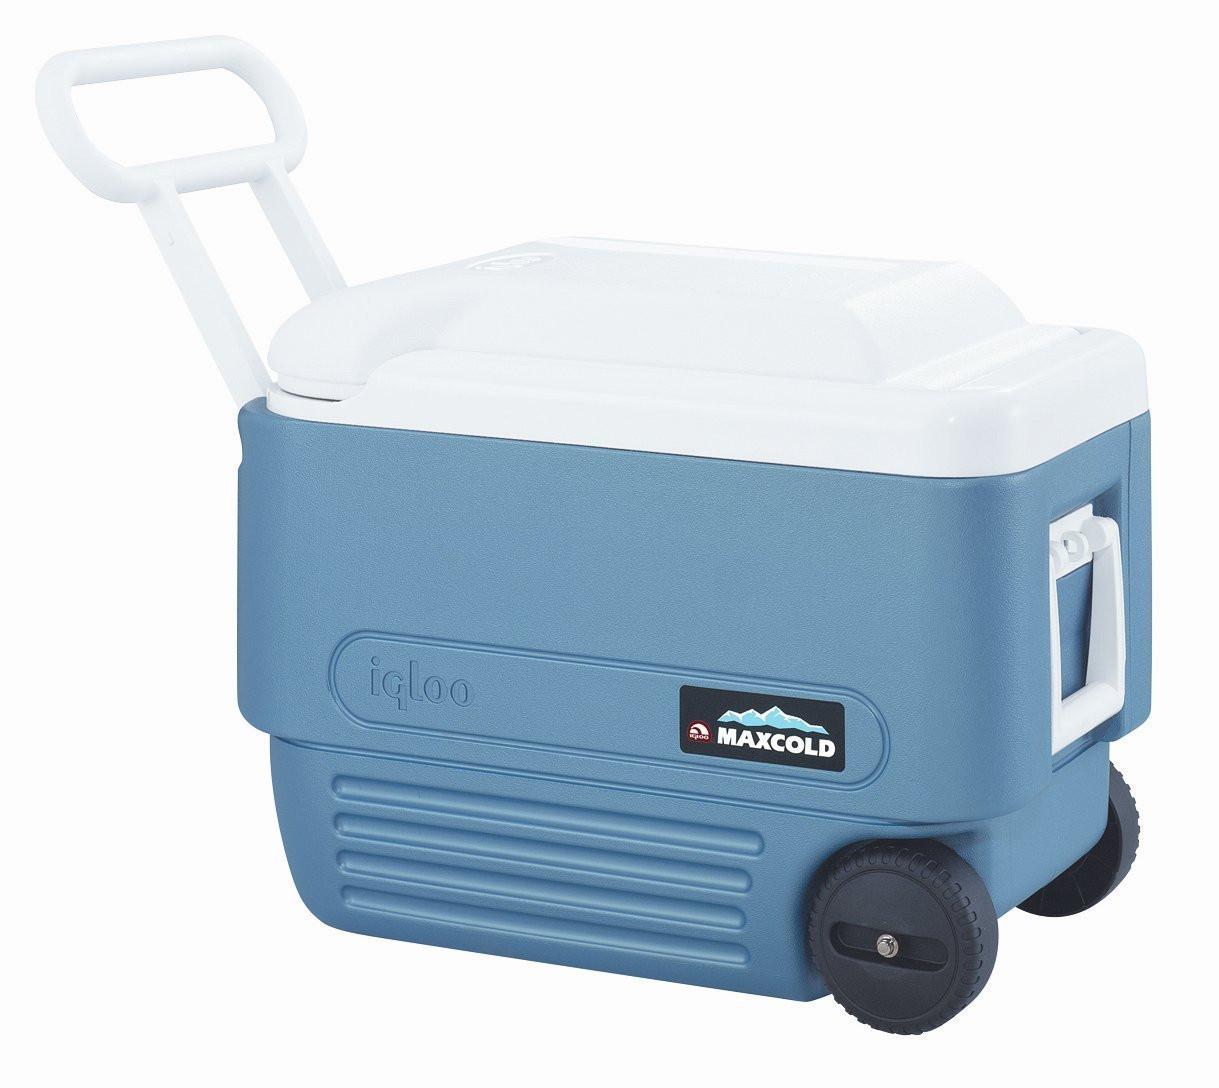 Ice Box Cooler : Igloo max cold l quart wheeled cool box roller